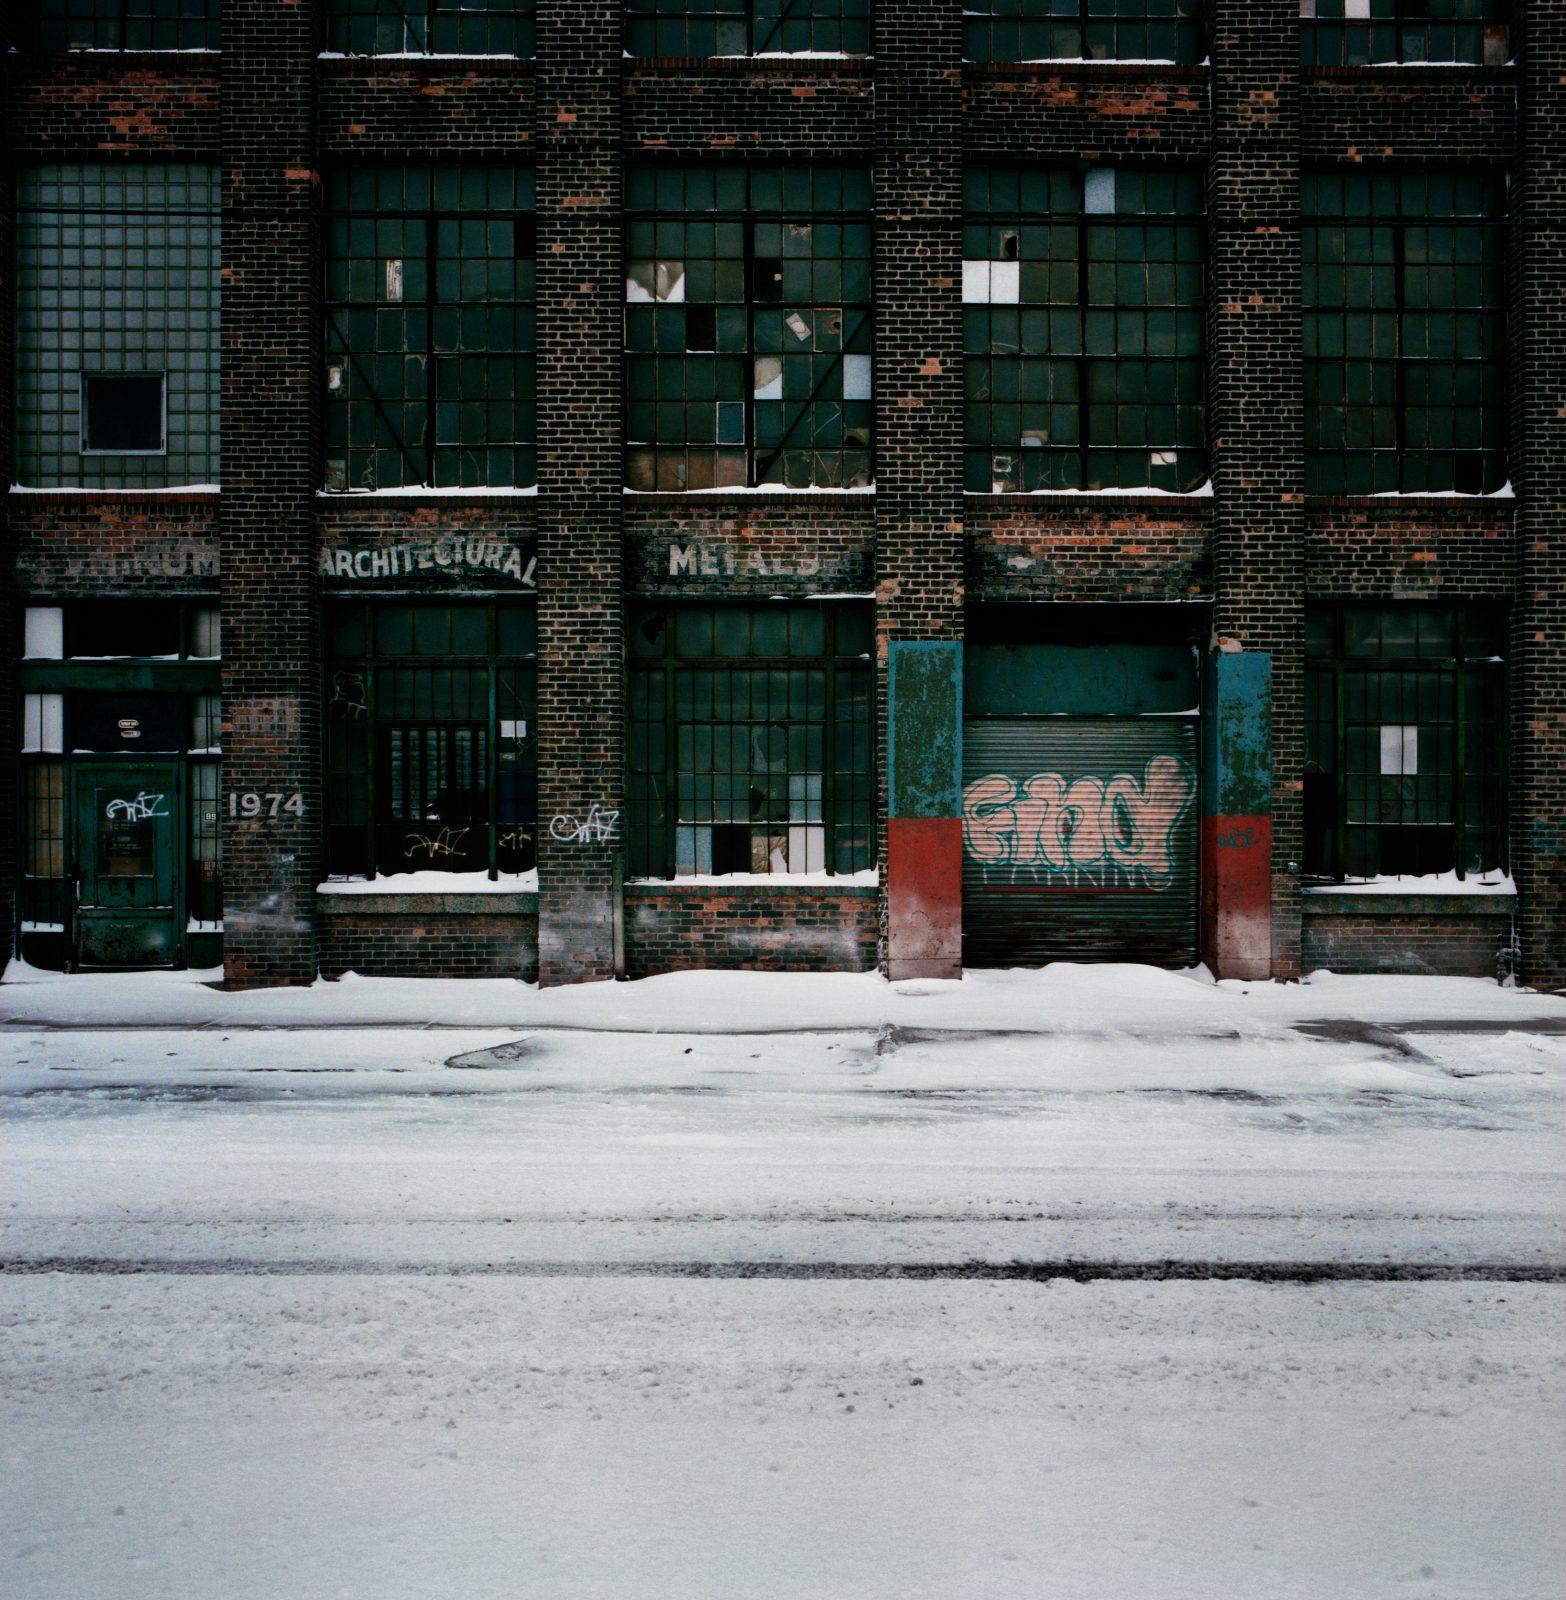 Architectural Metals, Detroit, Michigan - March 16, 2004